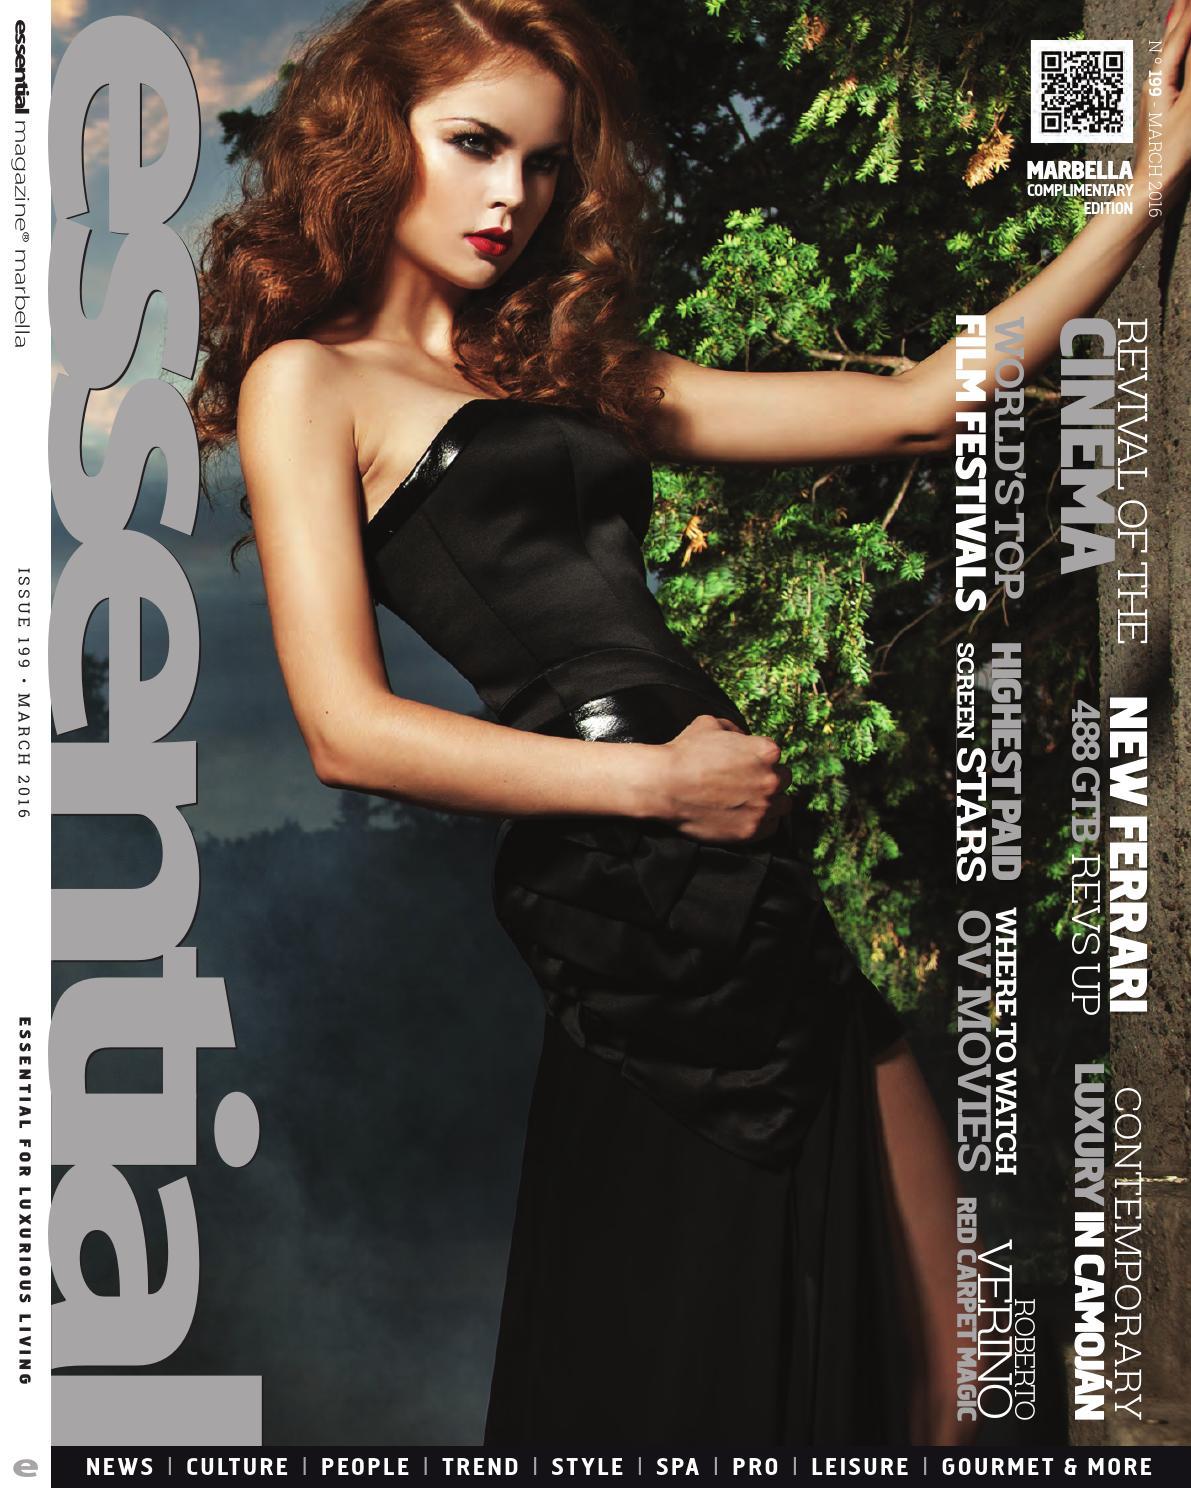 Essential Magazine March 2016 By Publicaciones Independientes